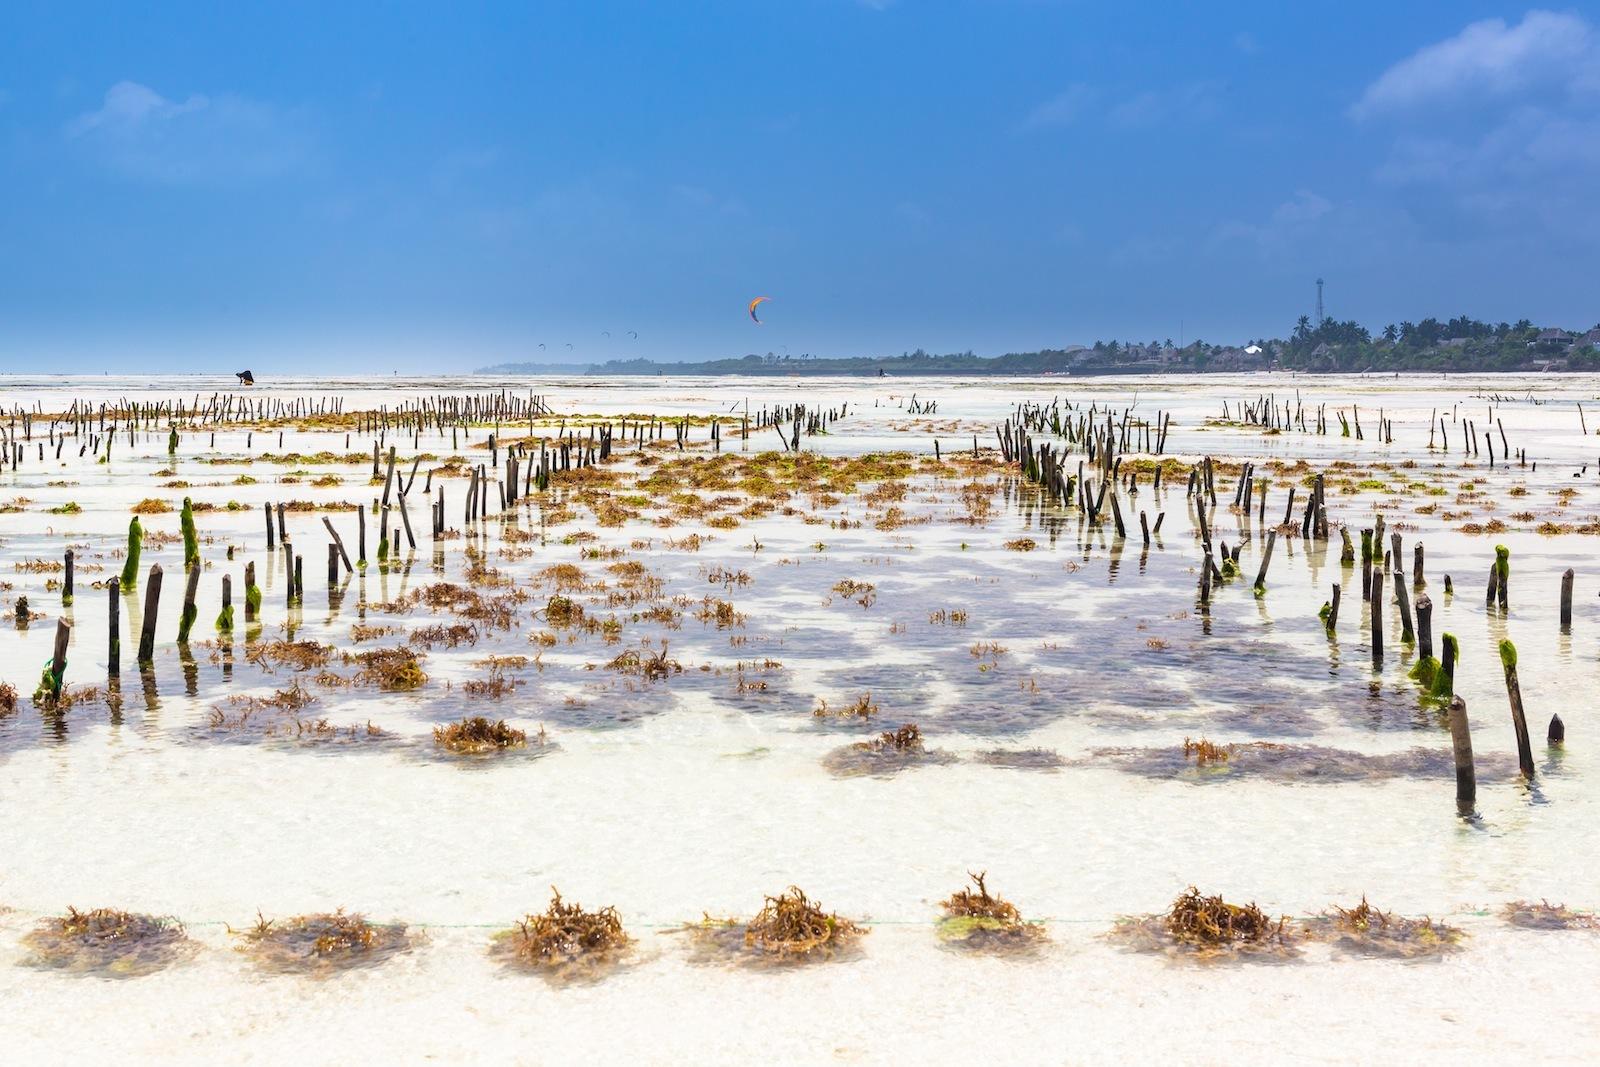 Granjeras de algas en el Índico (Zanzíbar [Tanzania]) Zanzibar1